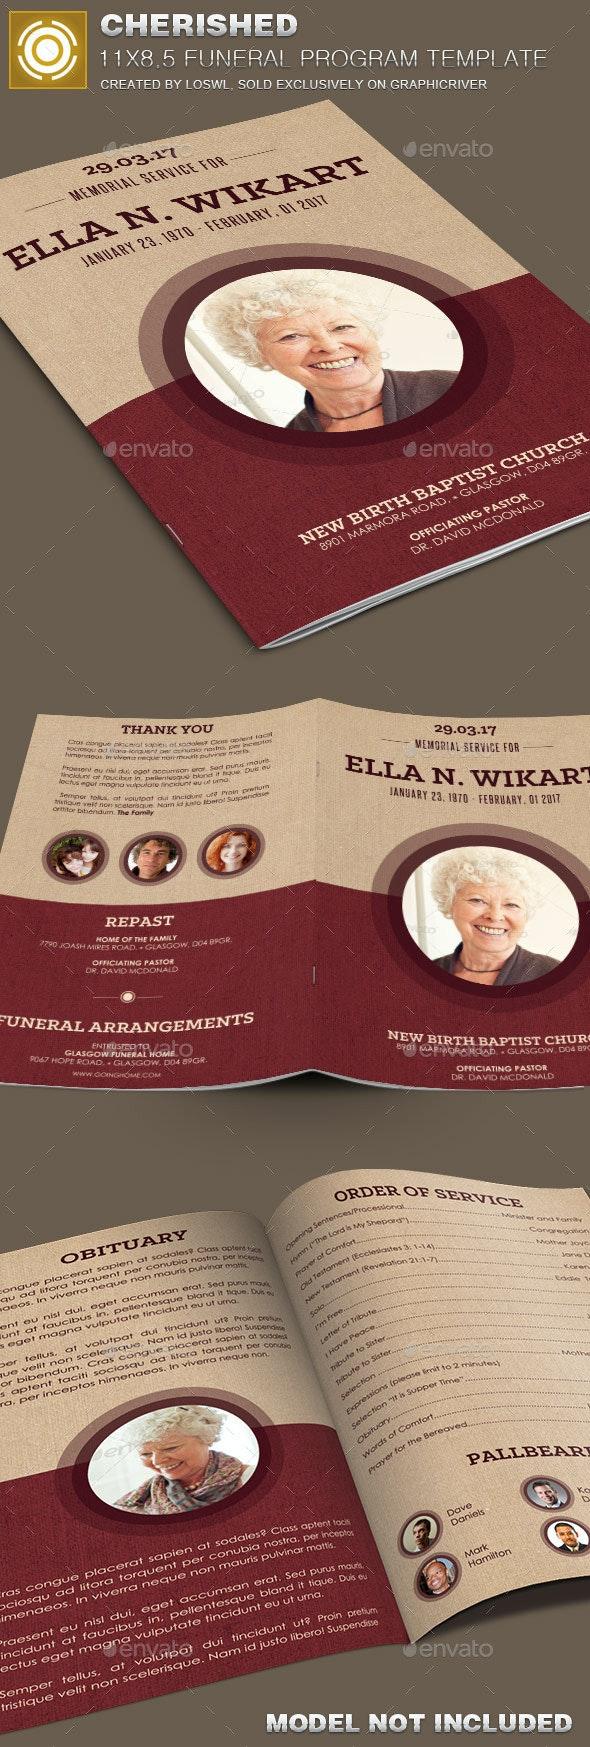 Cherished Funeral Program Template  - Informational Brochures